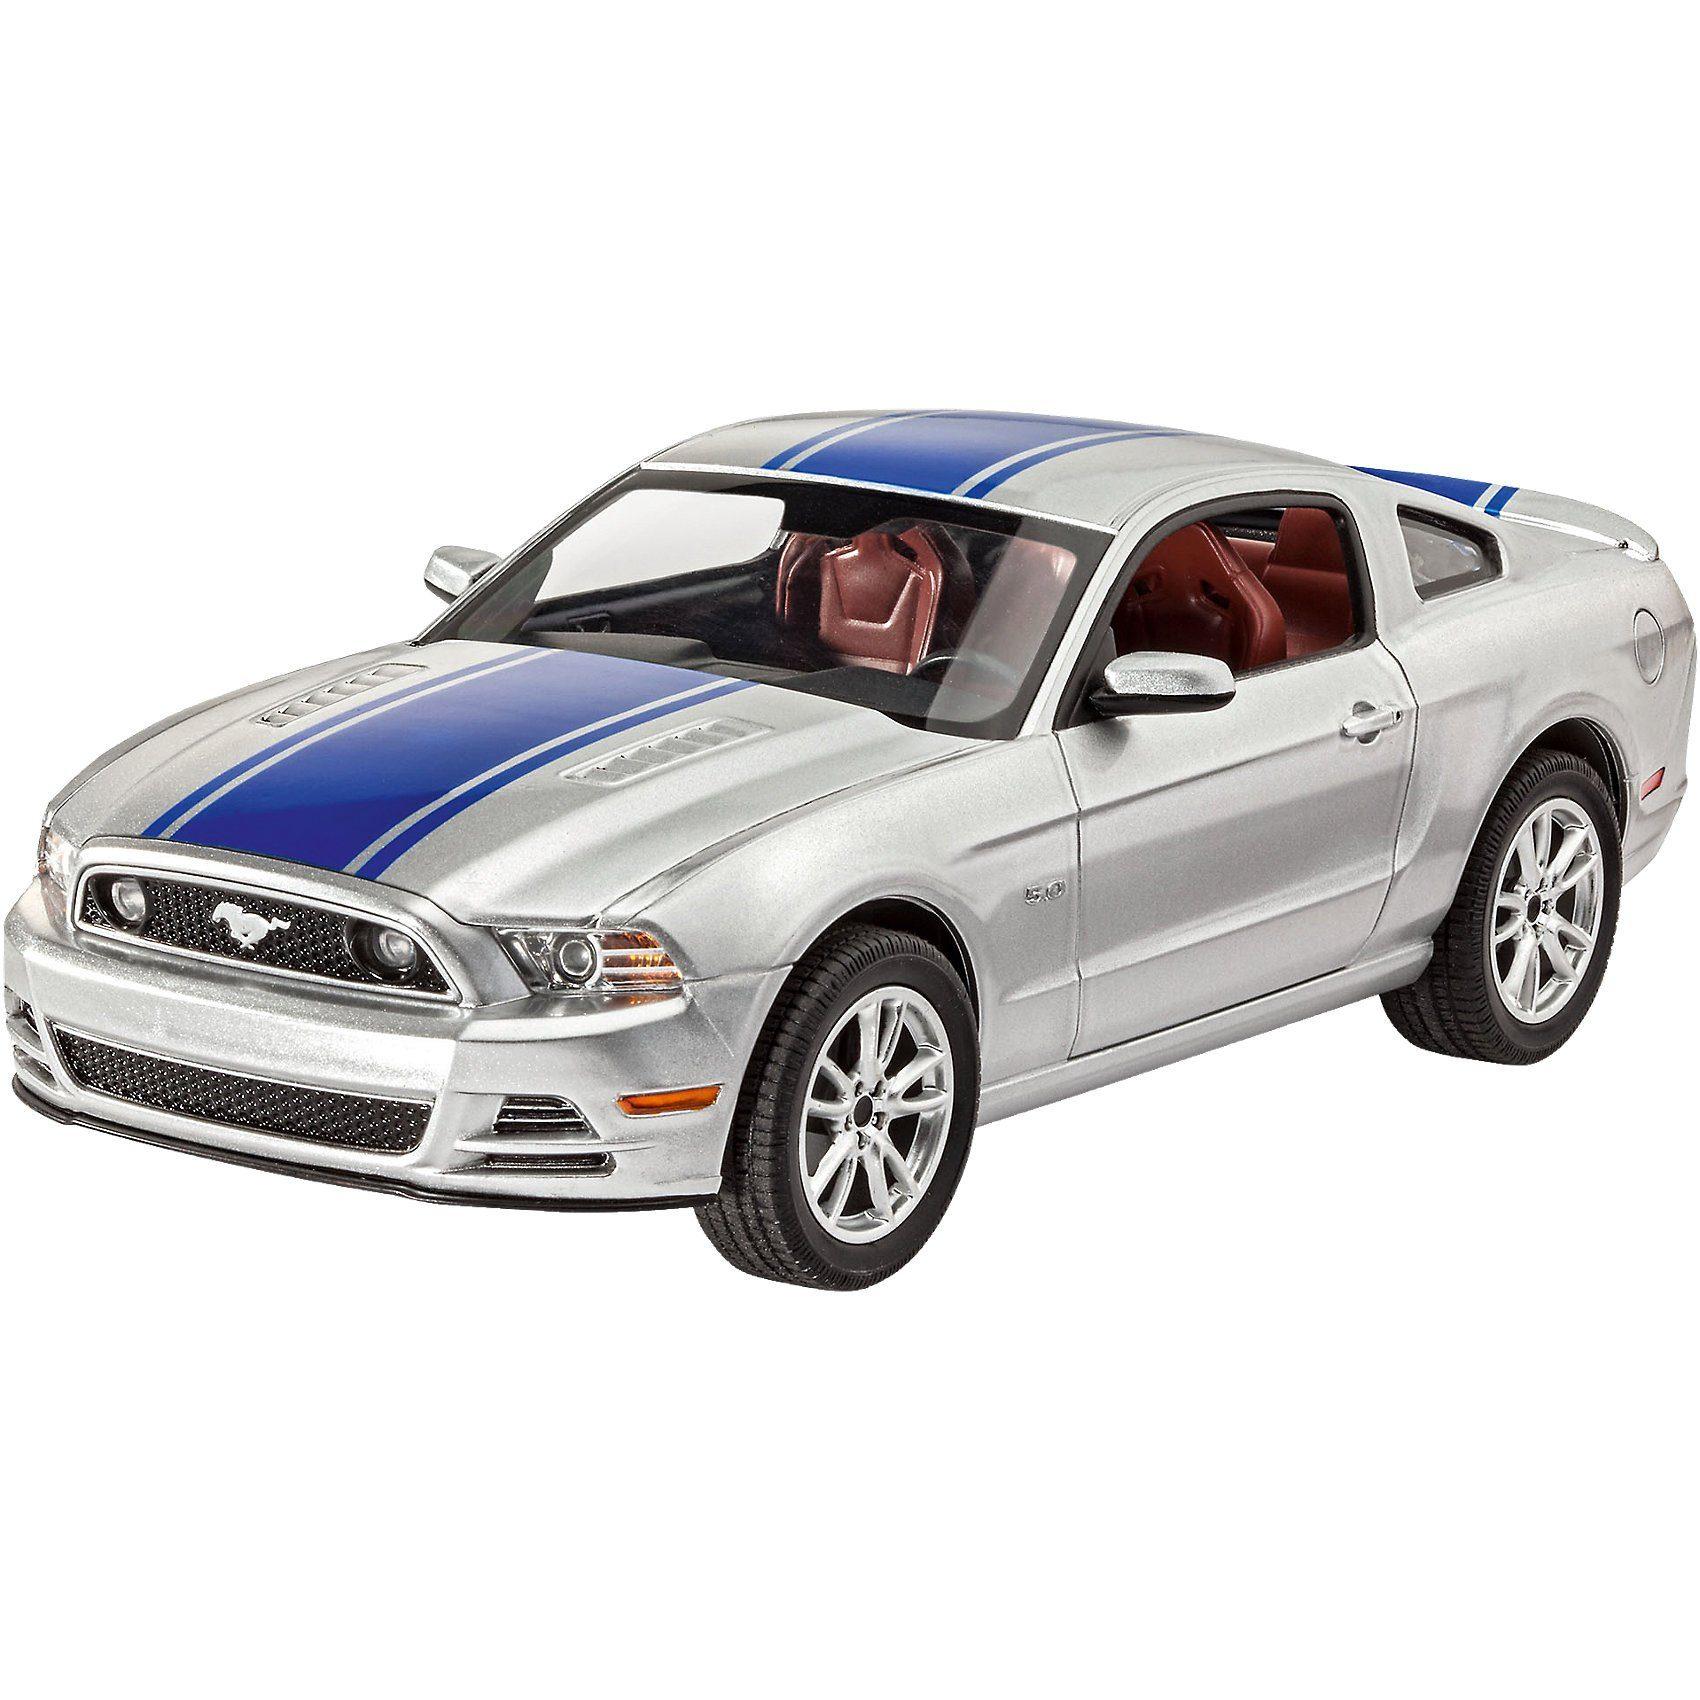 Revell Modellbausatz - 2014 Ford Mustang GT